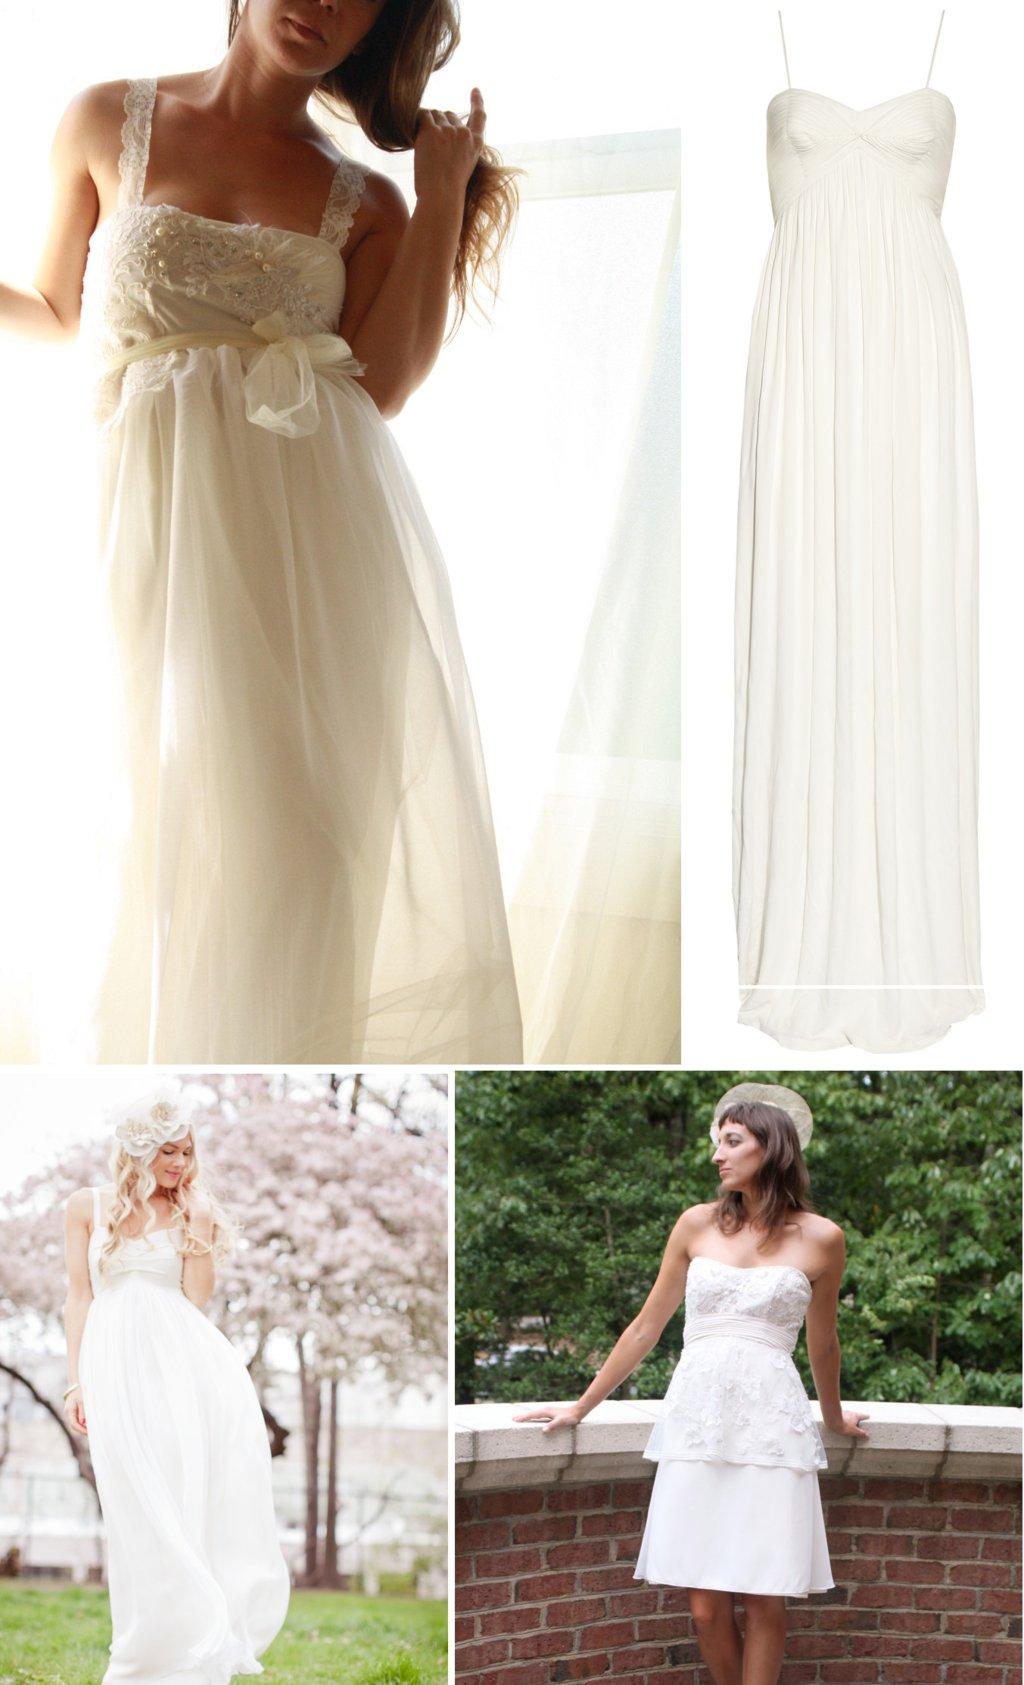 Empire-waist-wedding-dress-vintage-inspired-bridal-style.full